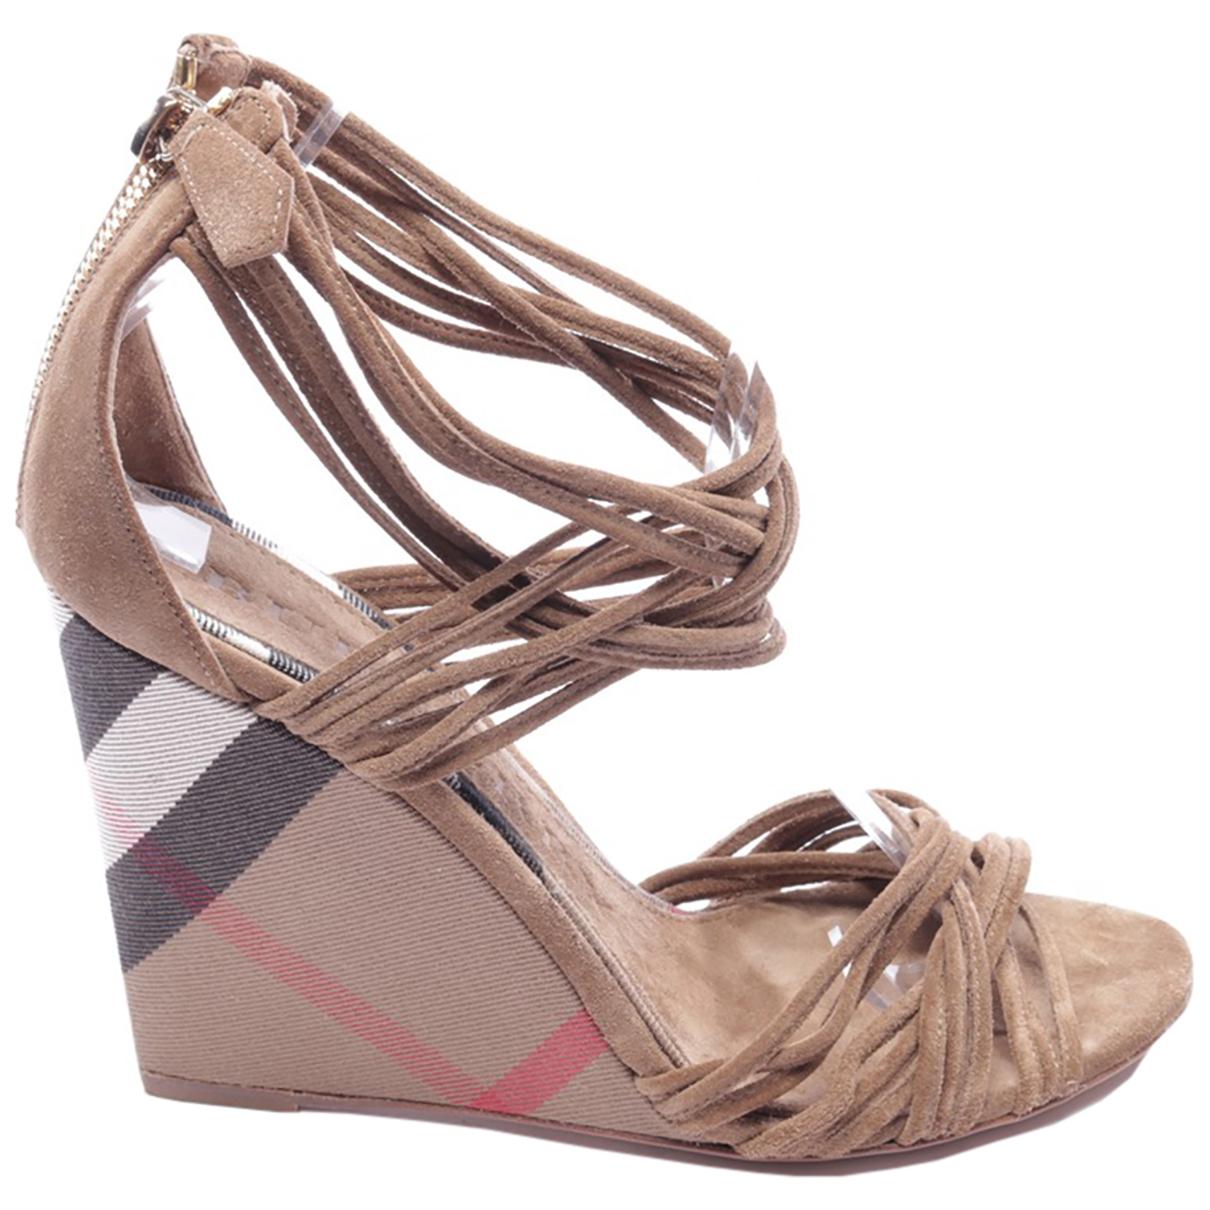 Burberry N Multicolour Leather Sandals for Women 39 EU